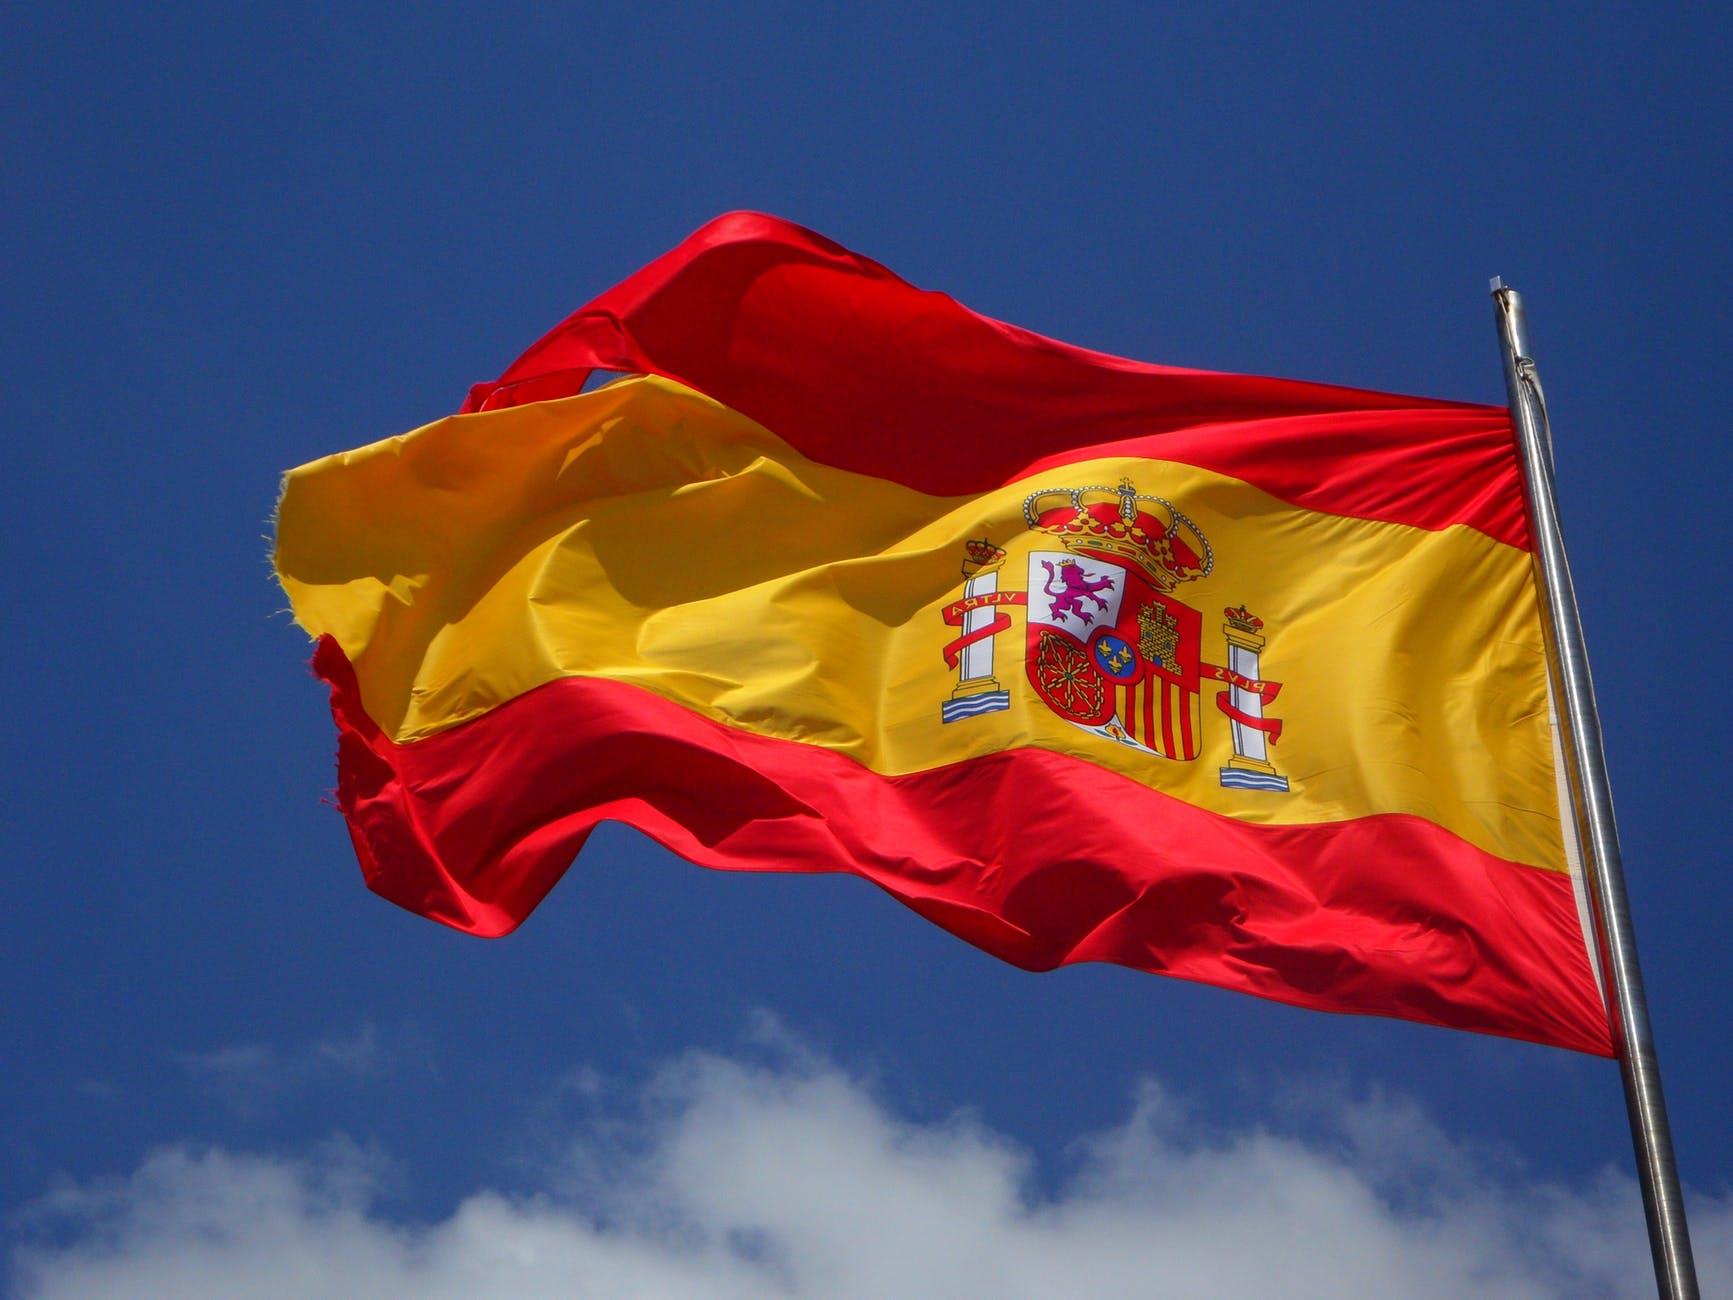 sky blue windy flag